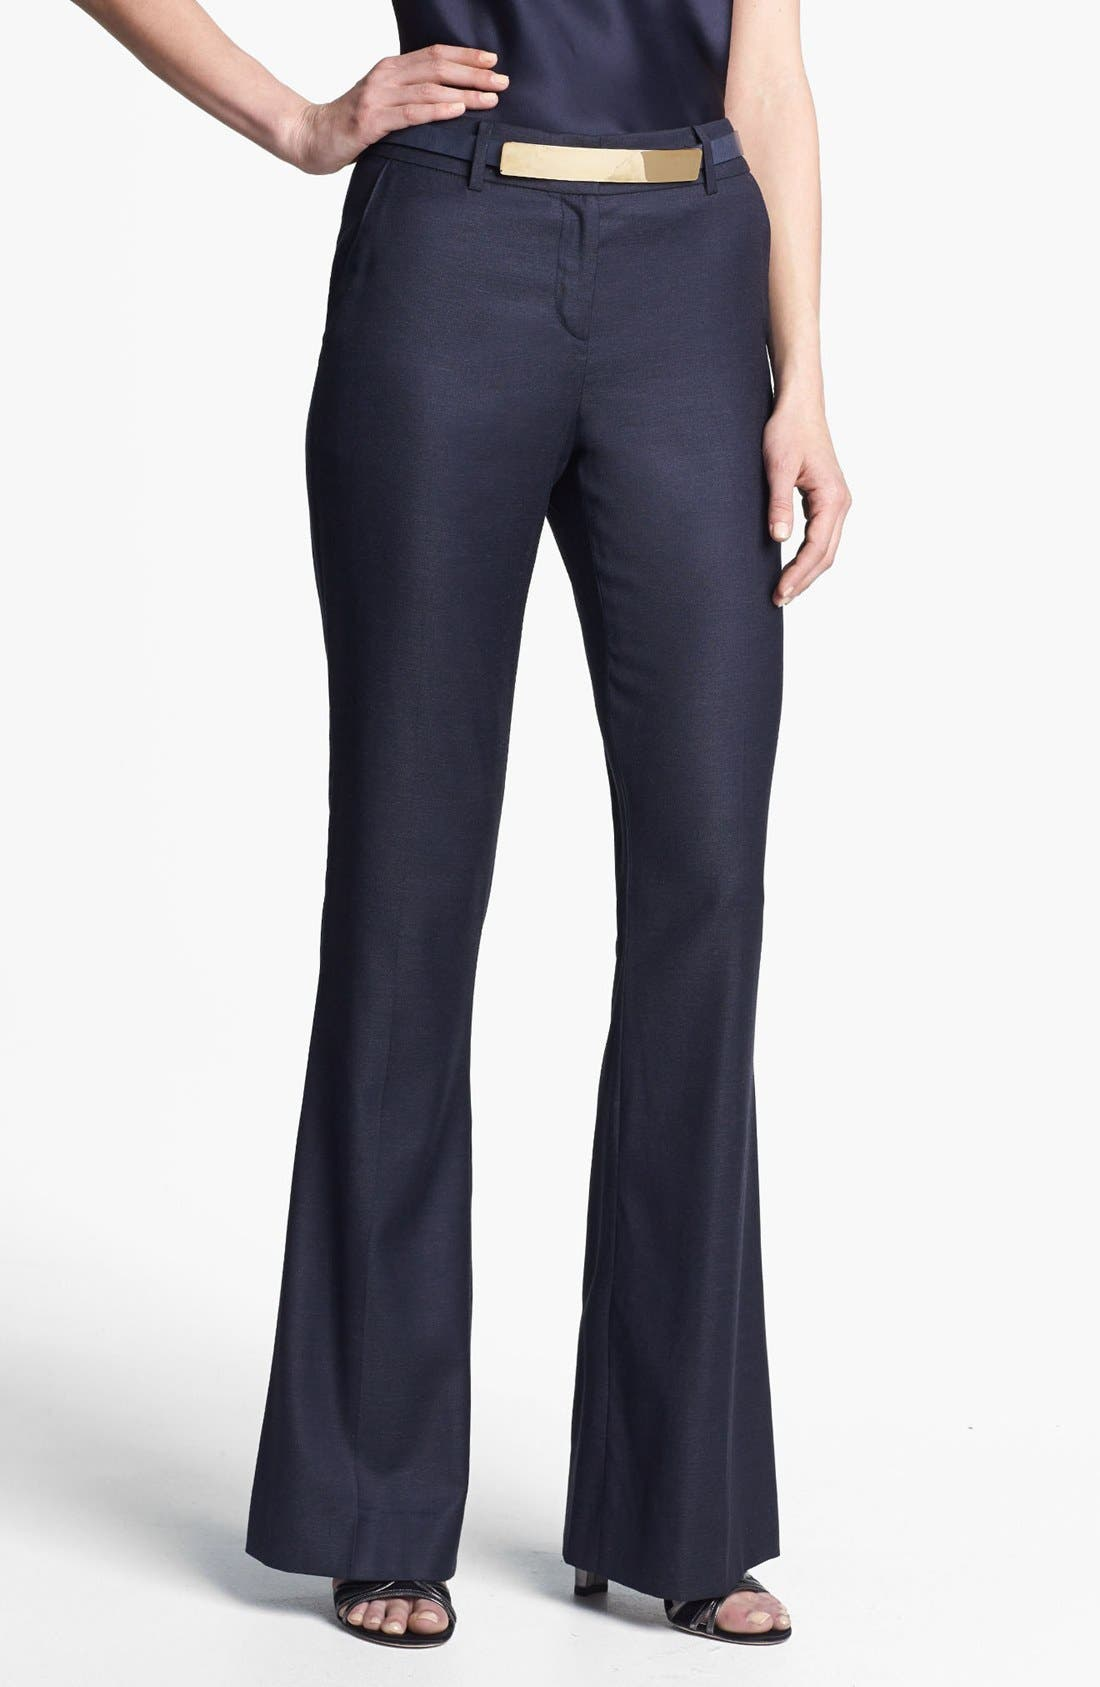 Main Image - St. John Collection Narrow Bootcut Shimmer Twill Pants